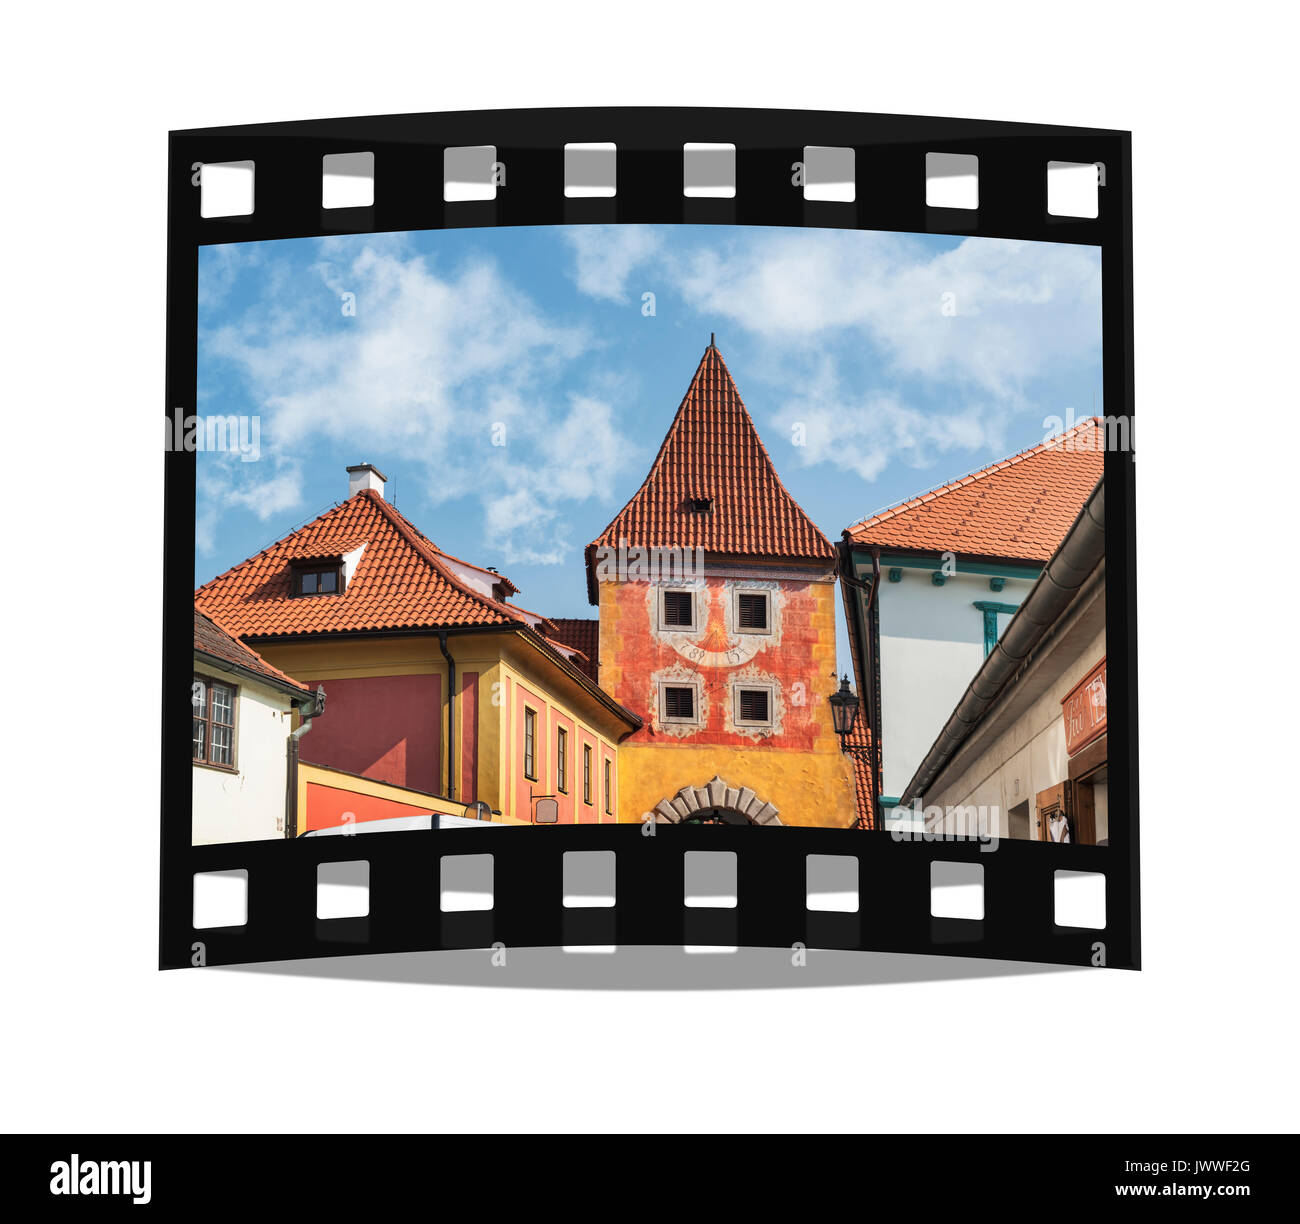 The Budejovicka gate was built from 1598 to 1602. It is a city gate still preserved today in Cesky Krumlov, Bohemia, Jihocesky kraj, Czech Republic, E - Stock Image